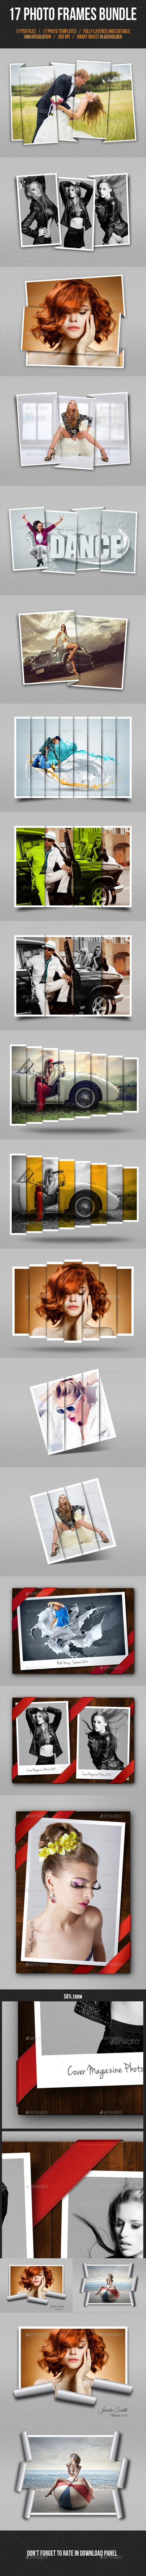 17 Photo Frames Bundle 06 - Artistic Photo Templates